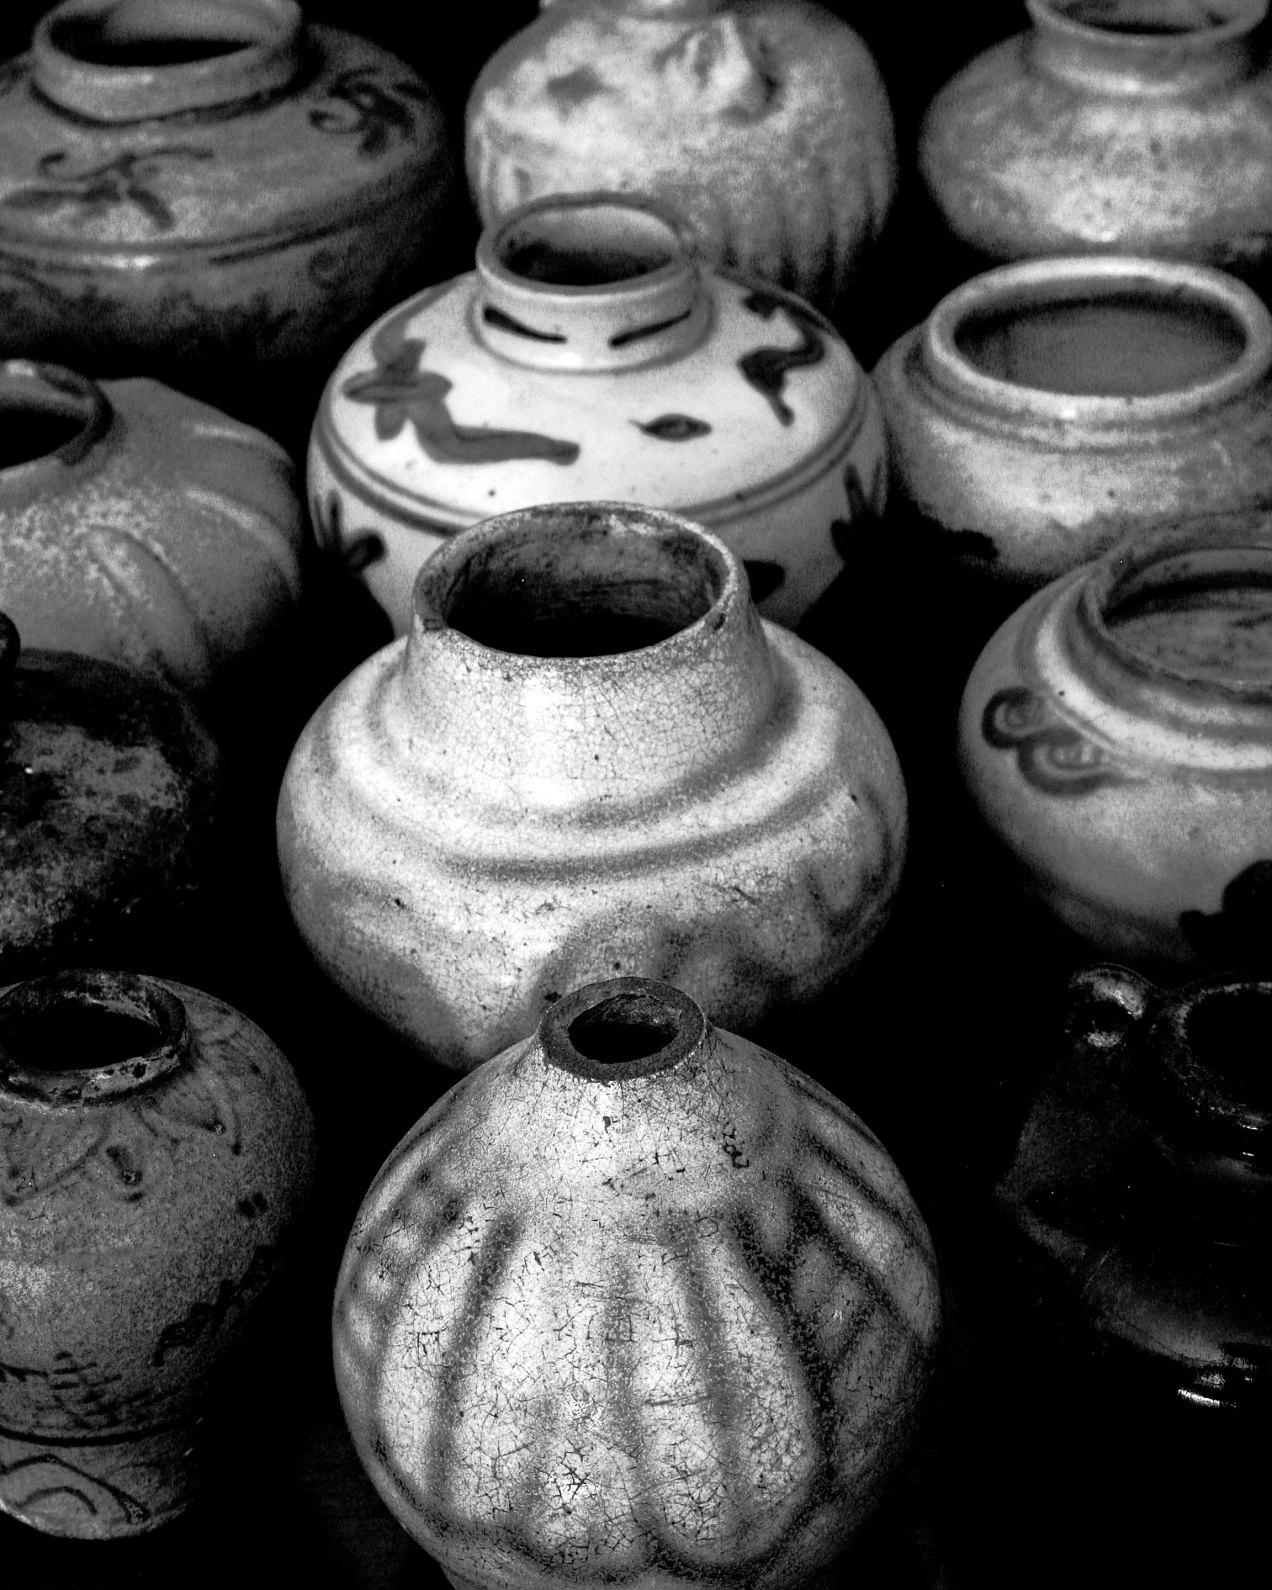 encriers chinois, Birmanie, gildalliere, 2006